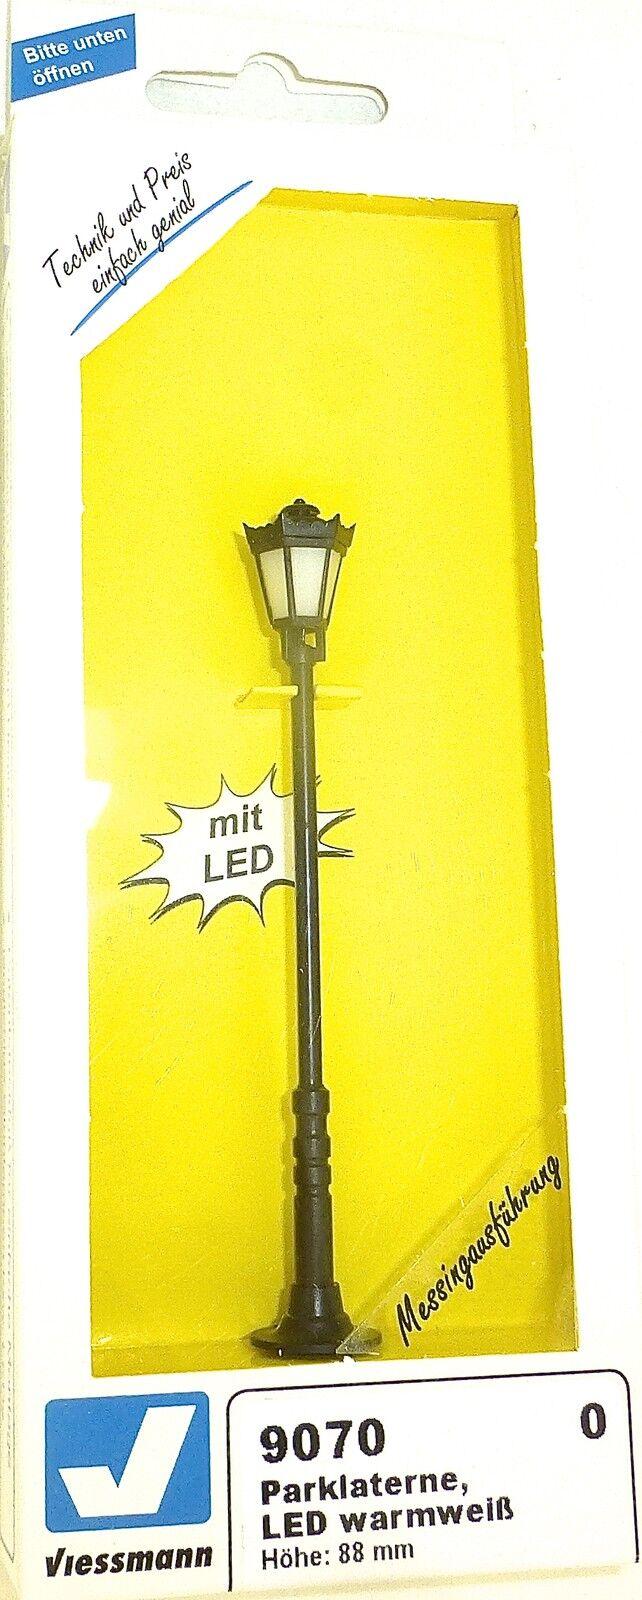 Lanterna Parco LED Bianco Caldo 88mm Alto viessuomon 9070 Scala 0 Nuovo Ovp  Q Μ